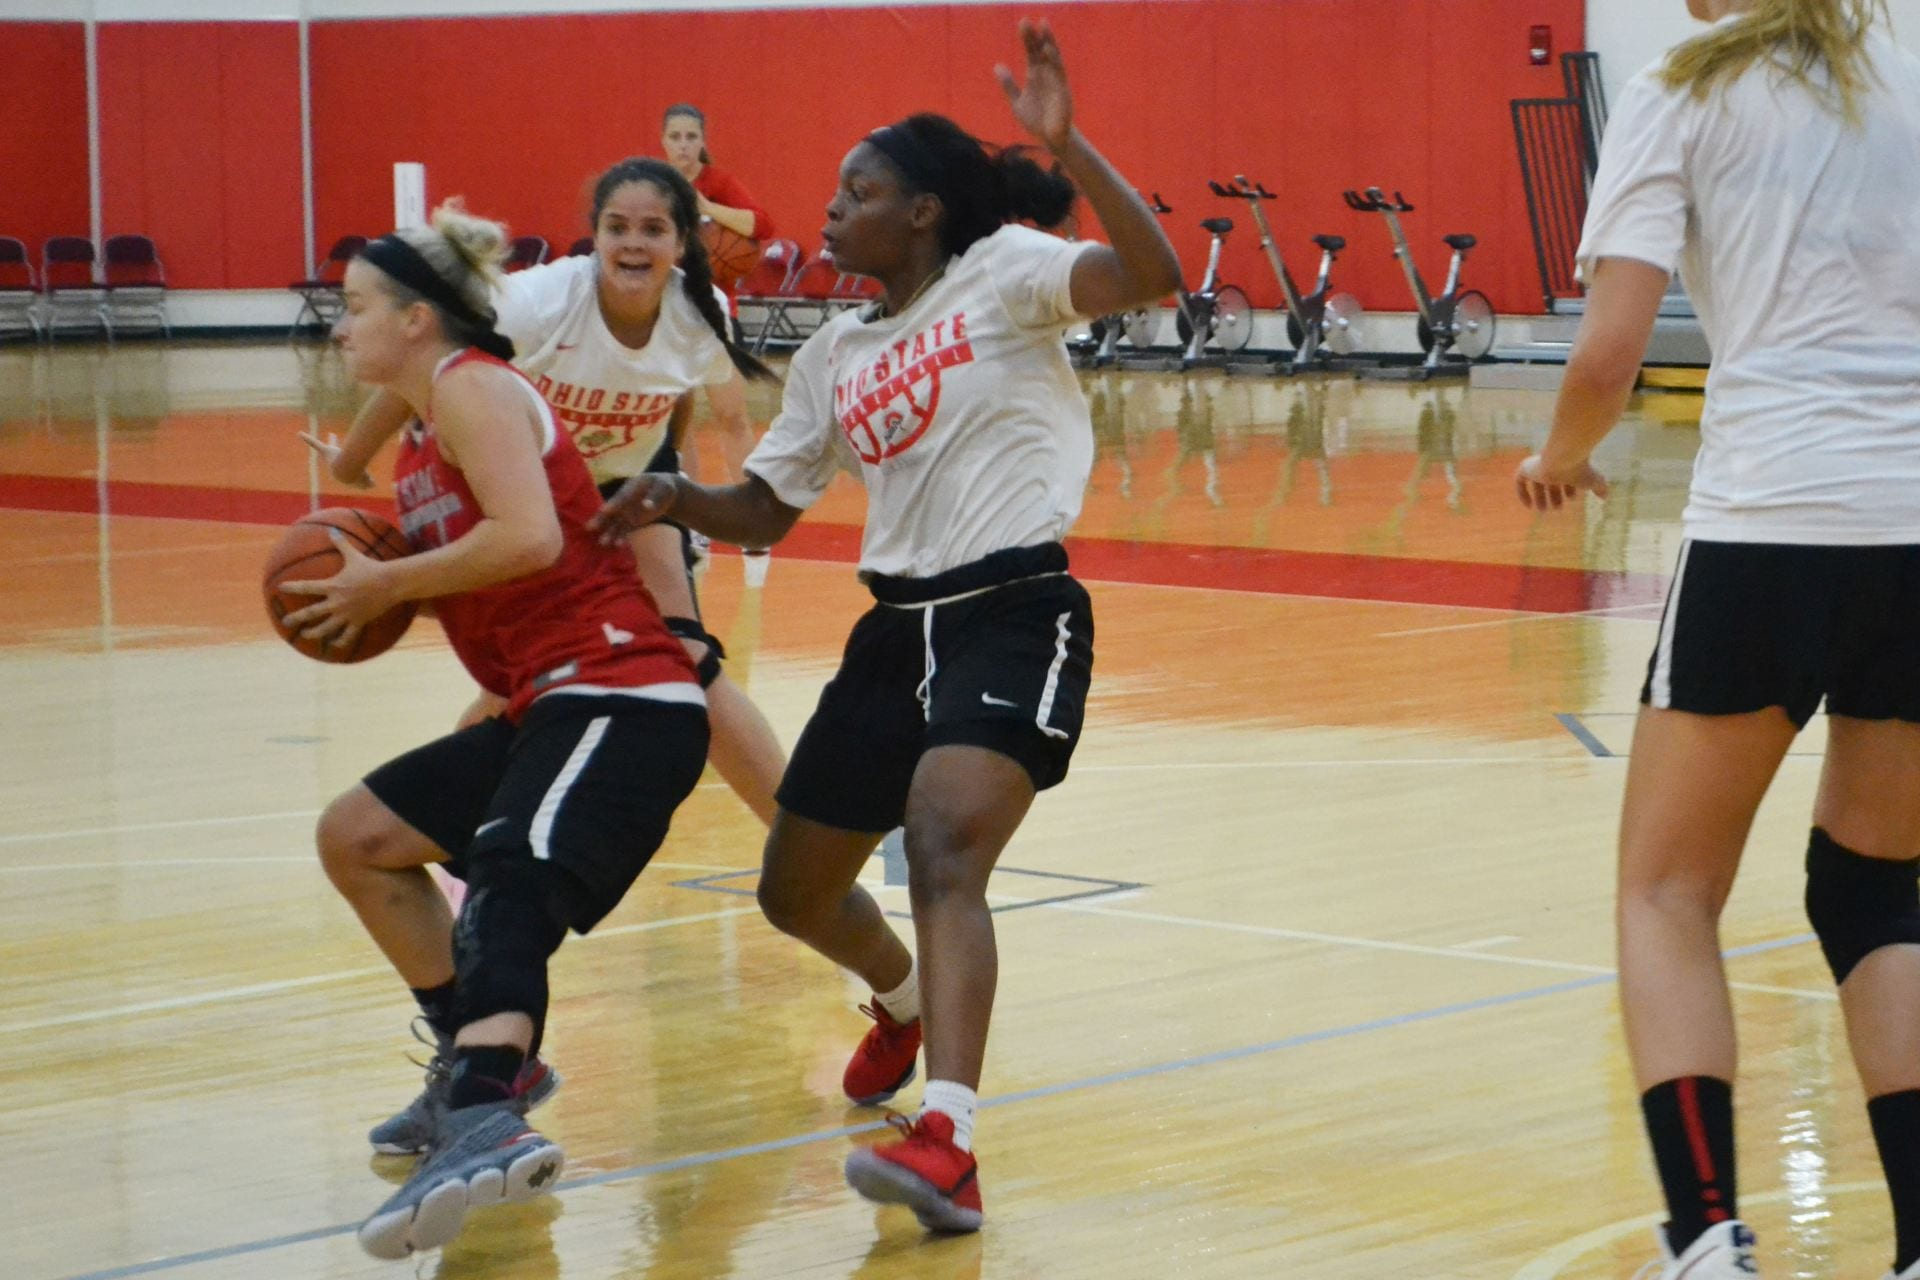 Women's Basketball: Pair of injured Buckeyes move forward after lost season